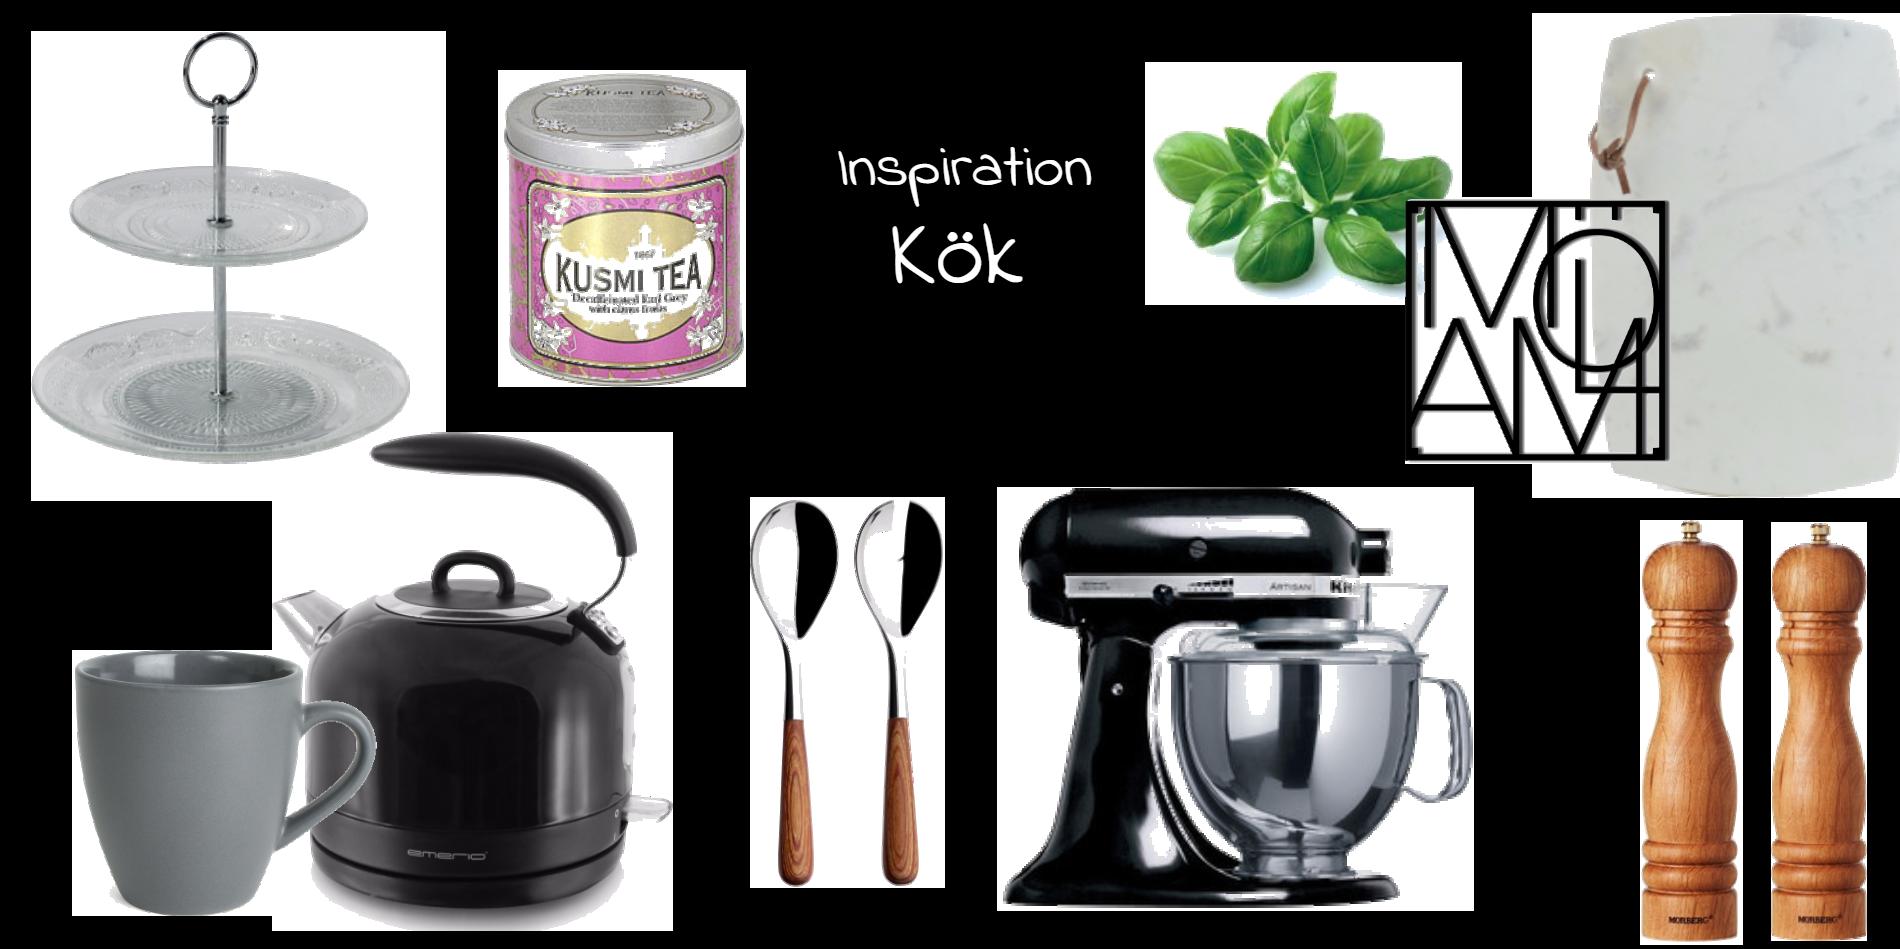 Inspiration - Kök